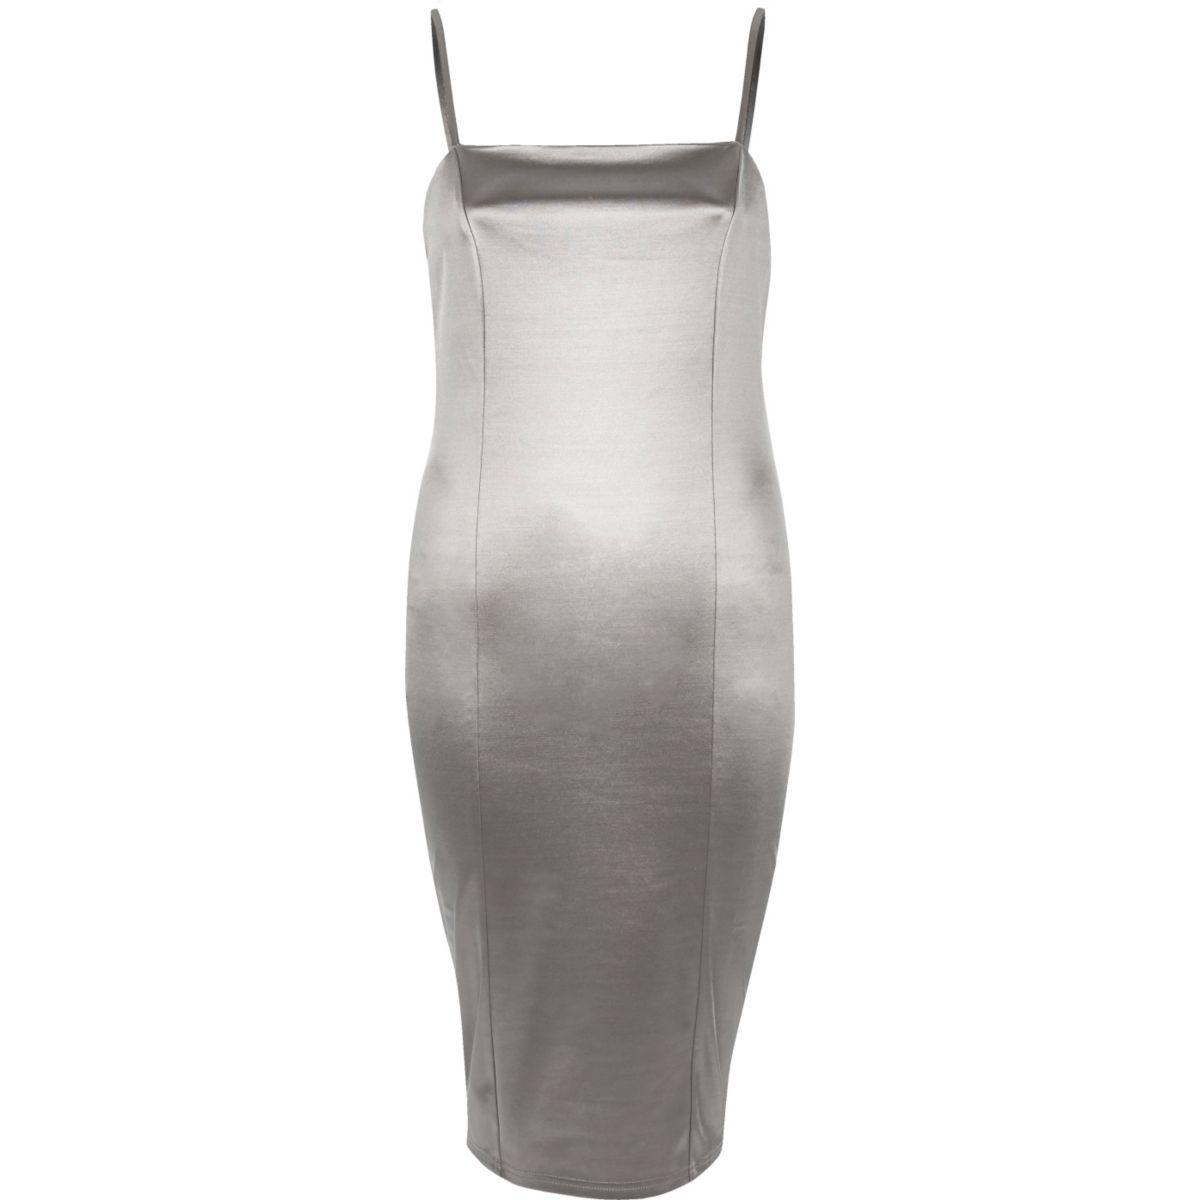 Silver strappy stretch bodycon dress